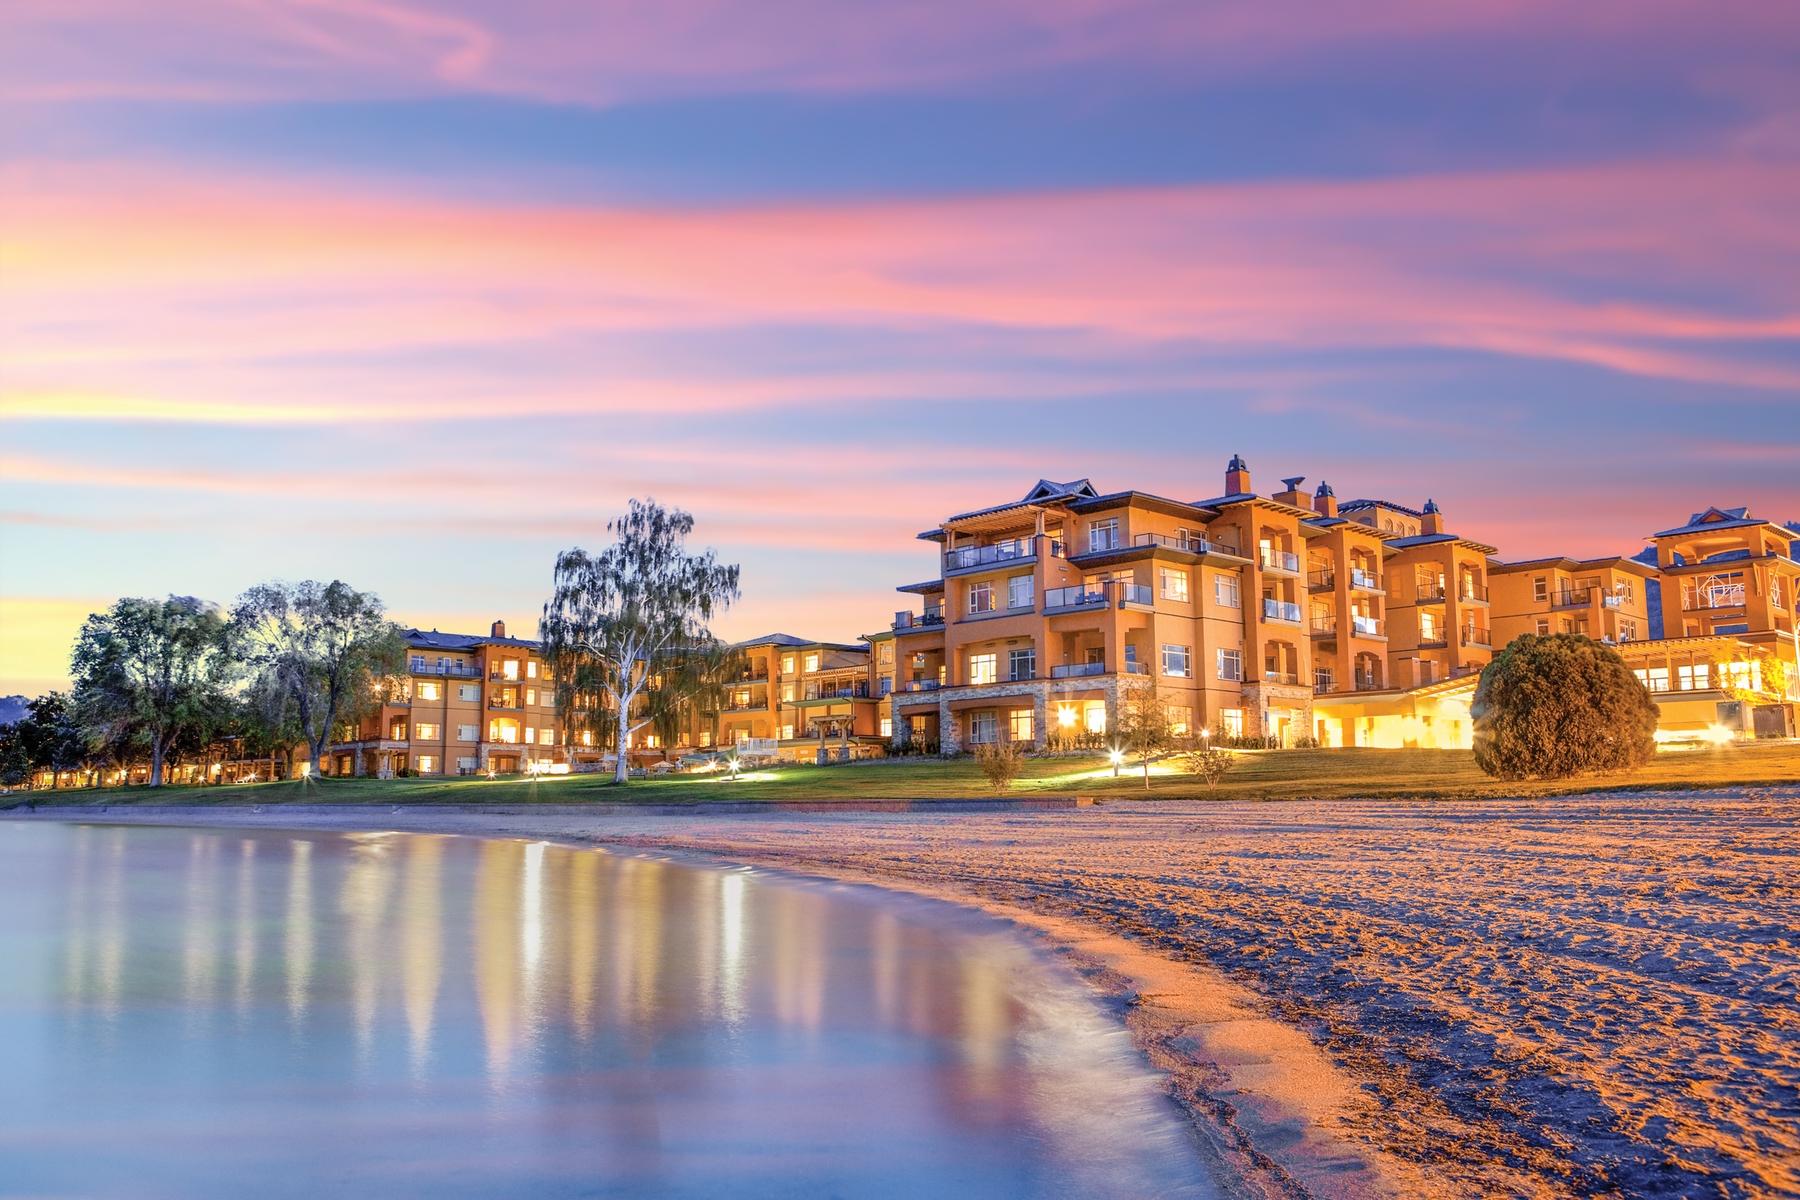 Sunset at Watermark Hotel, a popular BC beach resort